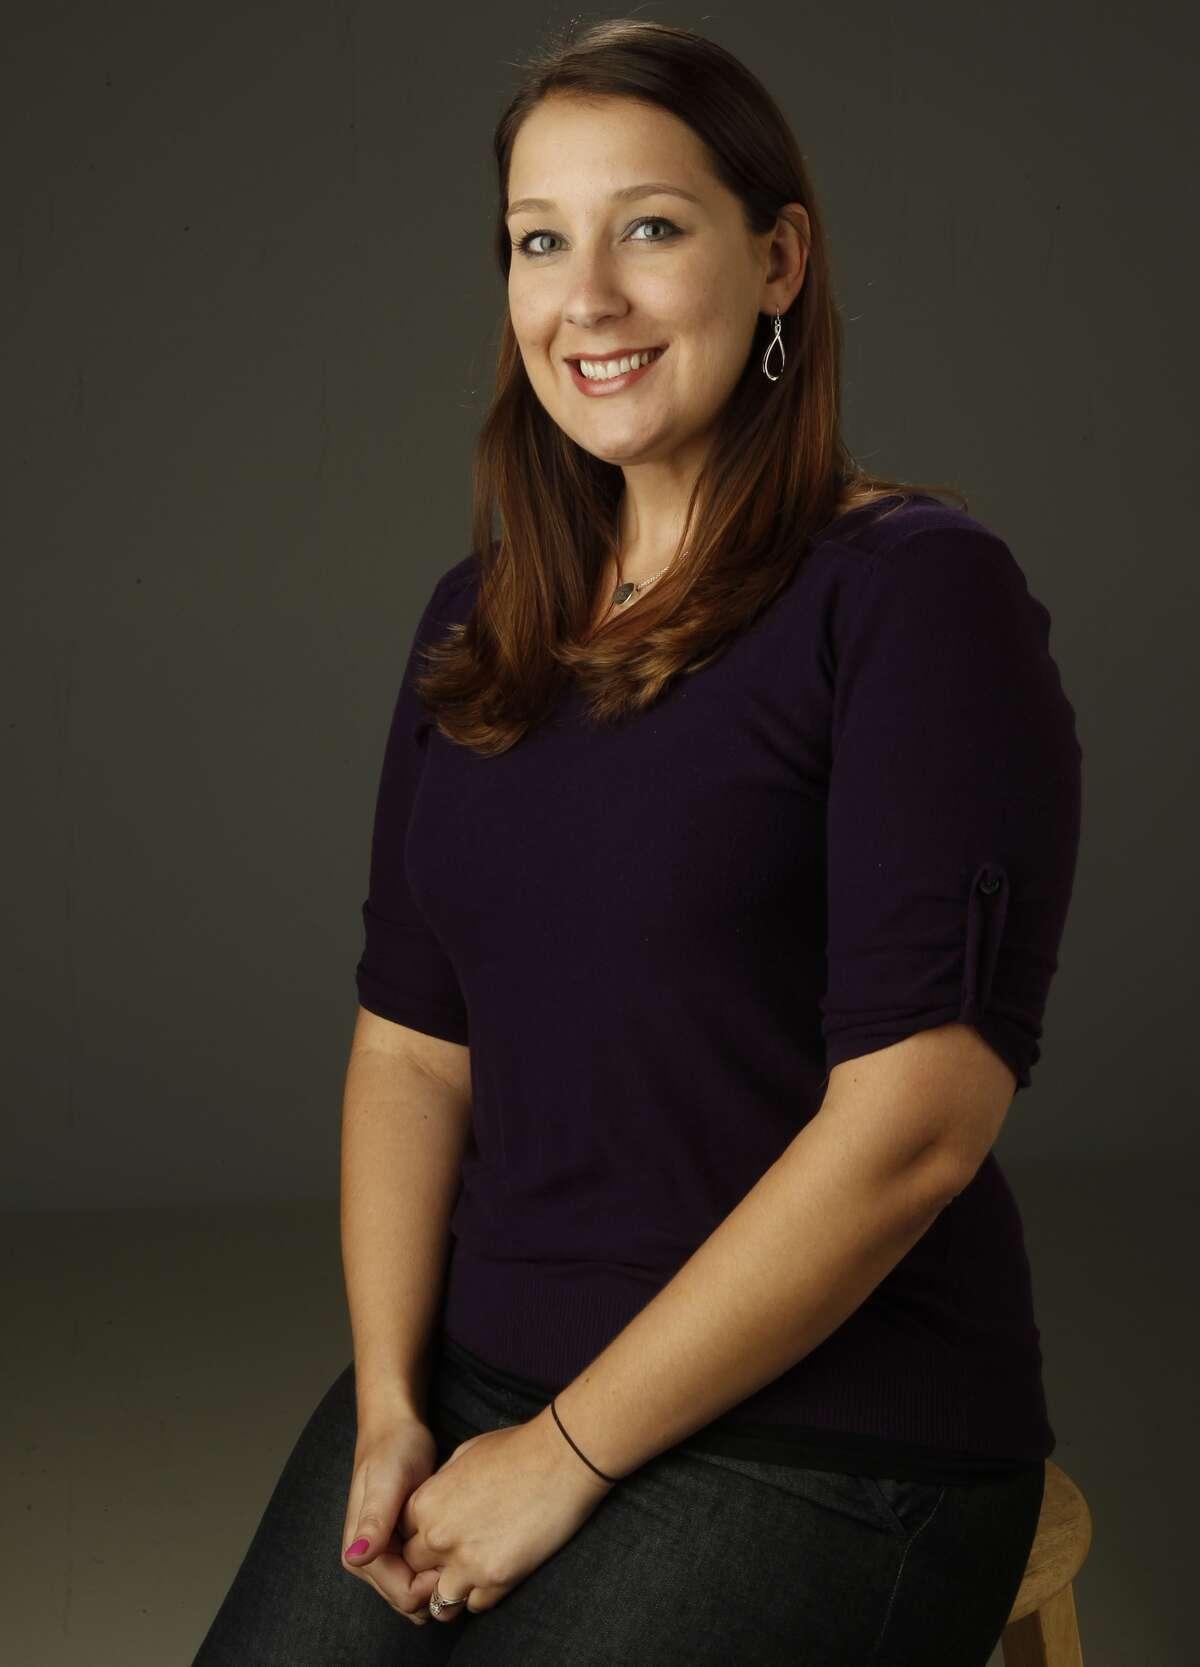 Houston Chronicle sports columnist Jenny Dial Creech